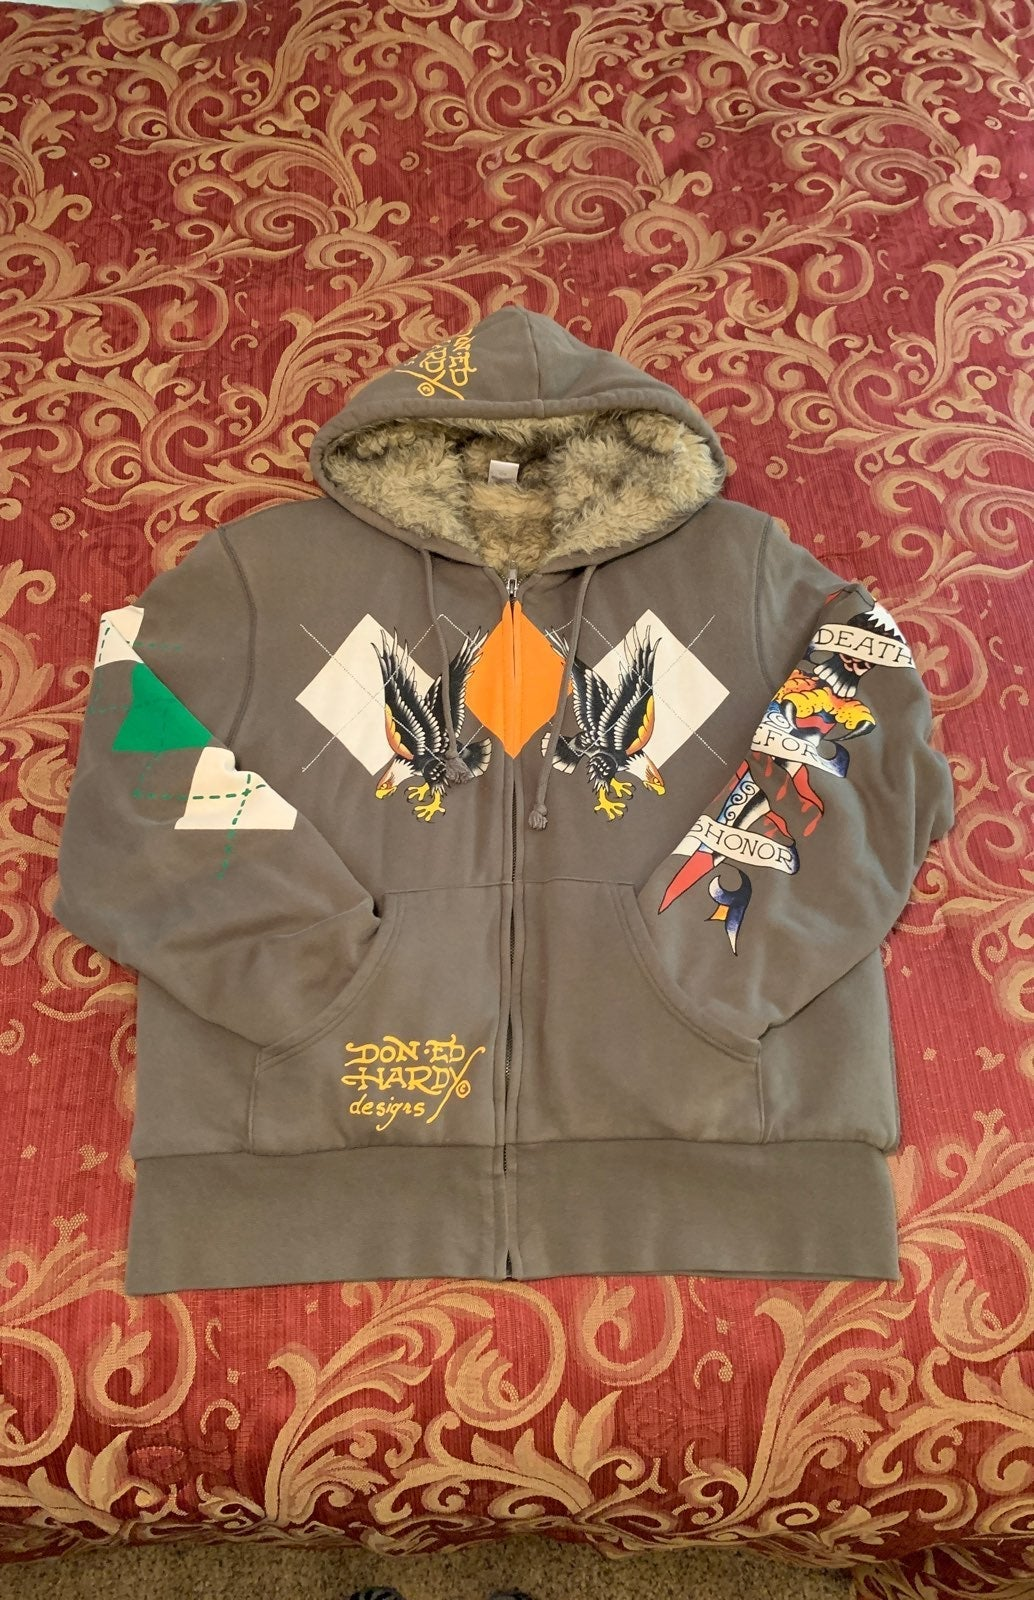 Don-Ed Hardy Designs fleece jacket